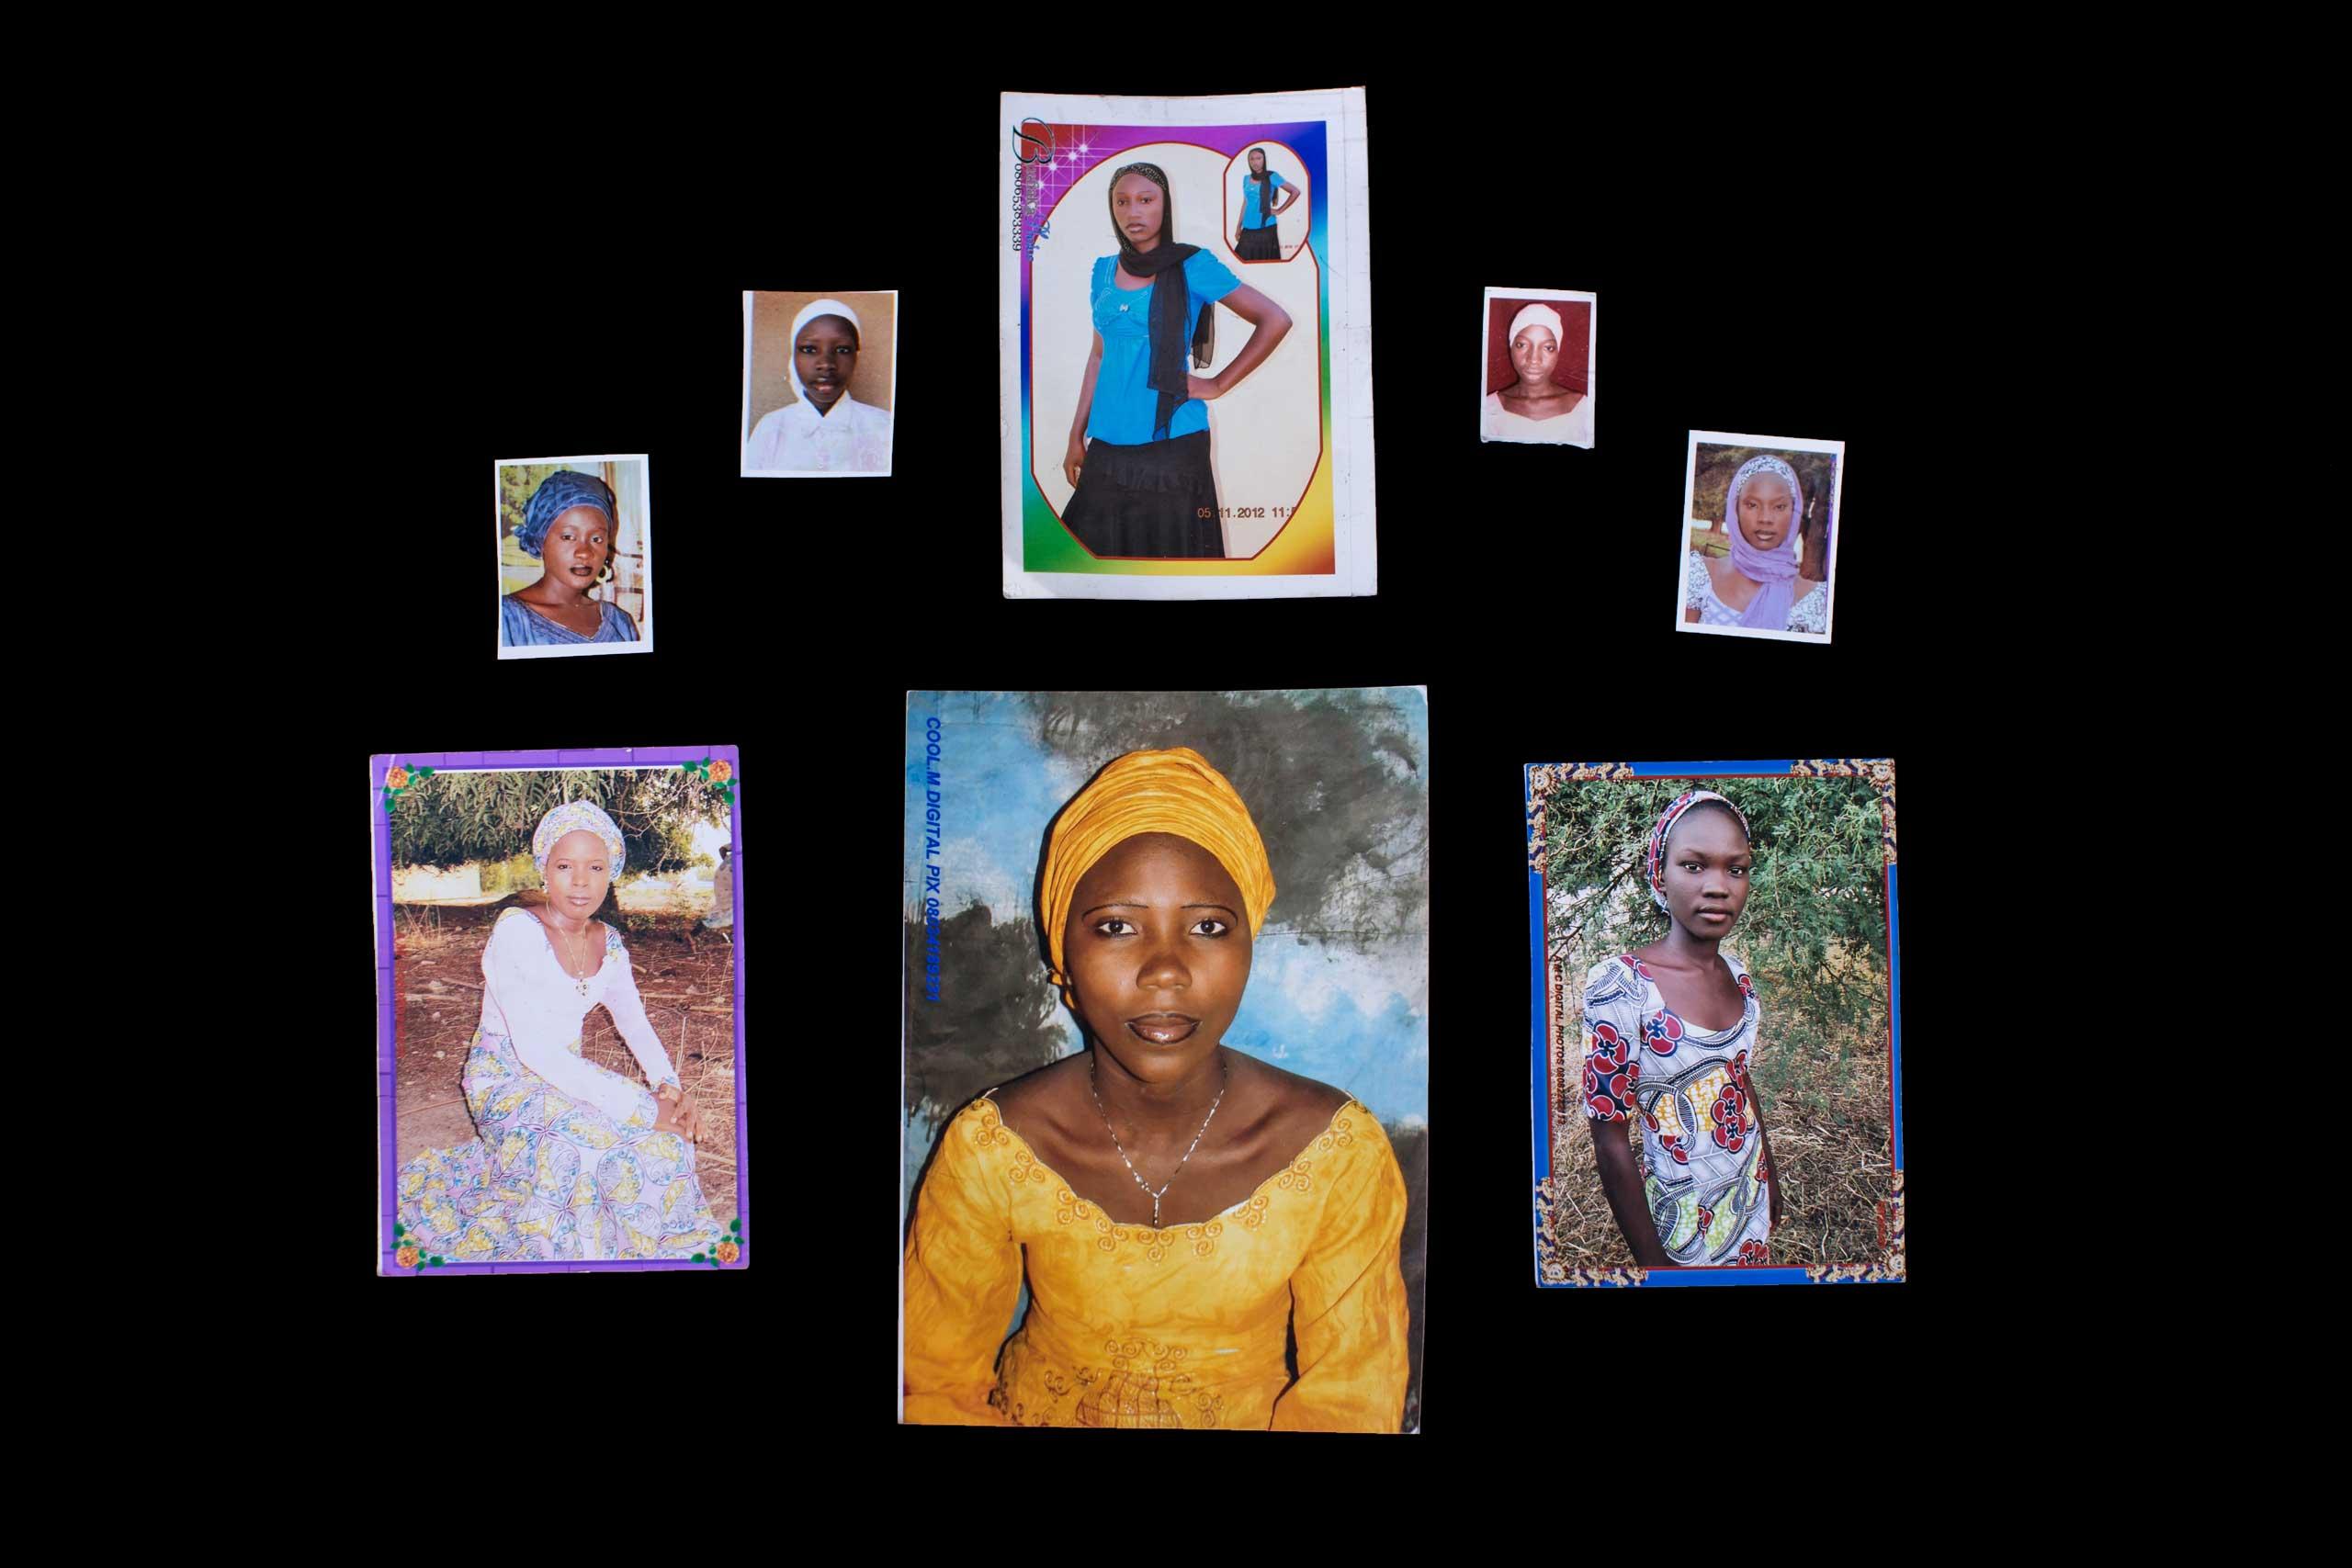 Photos of kidnapped Chibok girls, provided by their families. Top row left, to right: Yana Pogu, Rhoda Peters, Saratu Ayuba, Comfort, Bullus, Dorcas Yakubu. Bottom row, left to right: Hauwa Mutah, Hajara Isa, Rivkatu Ngalang.